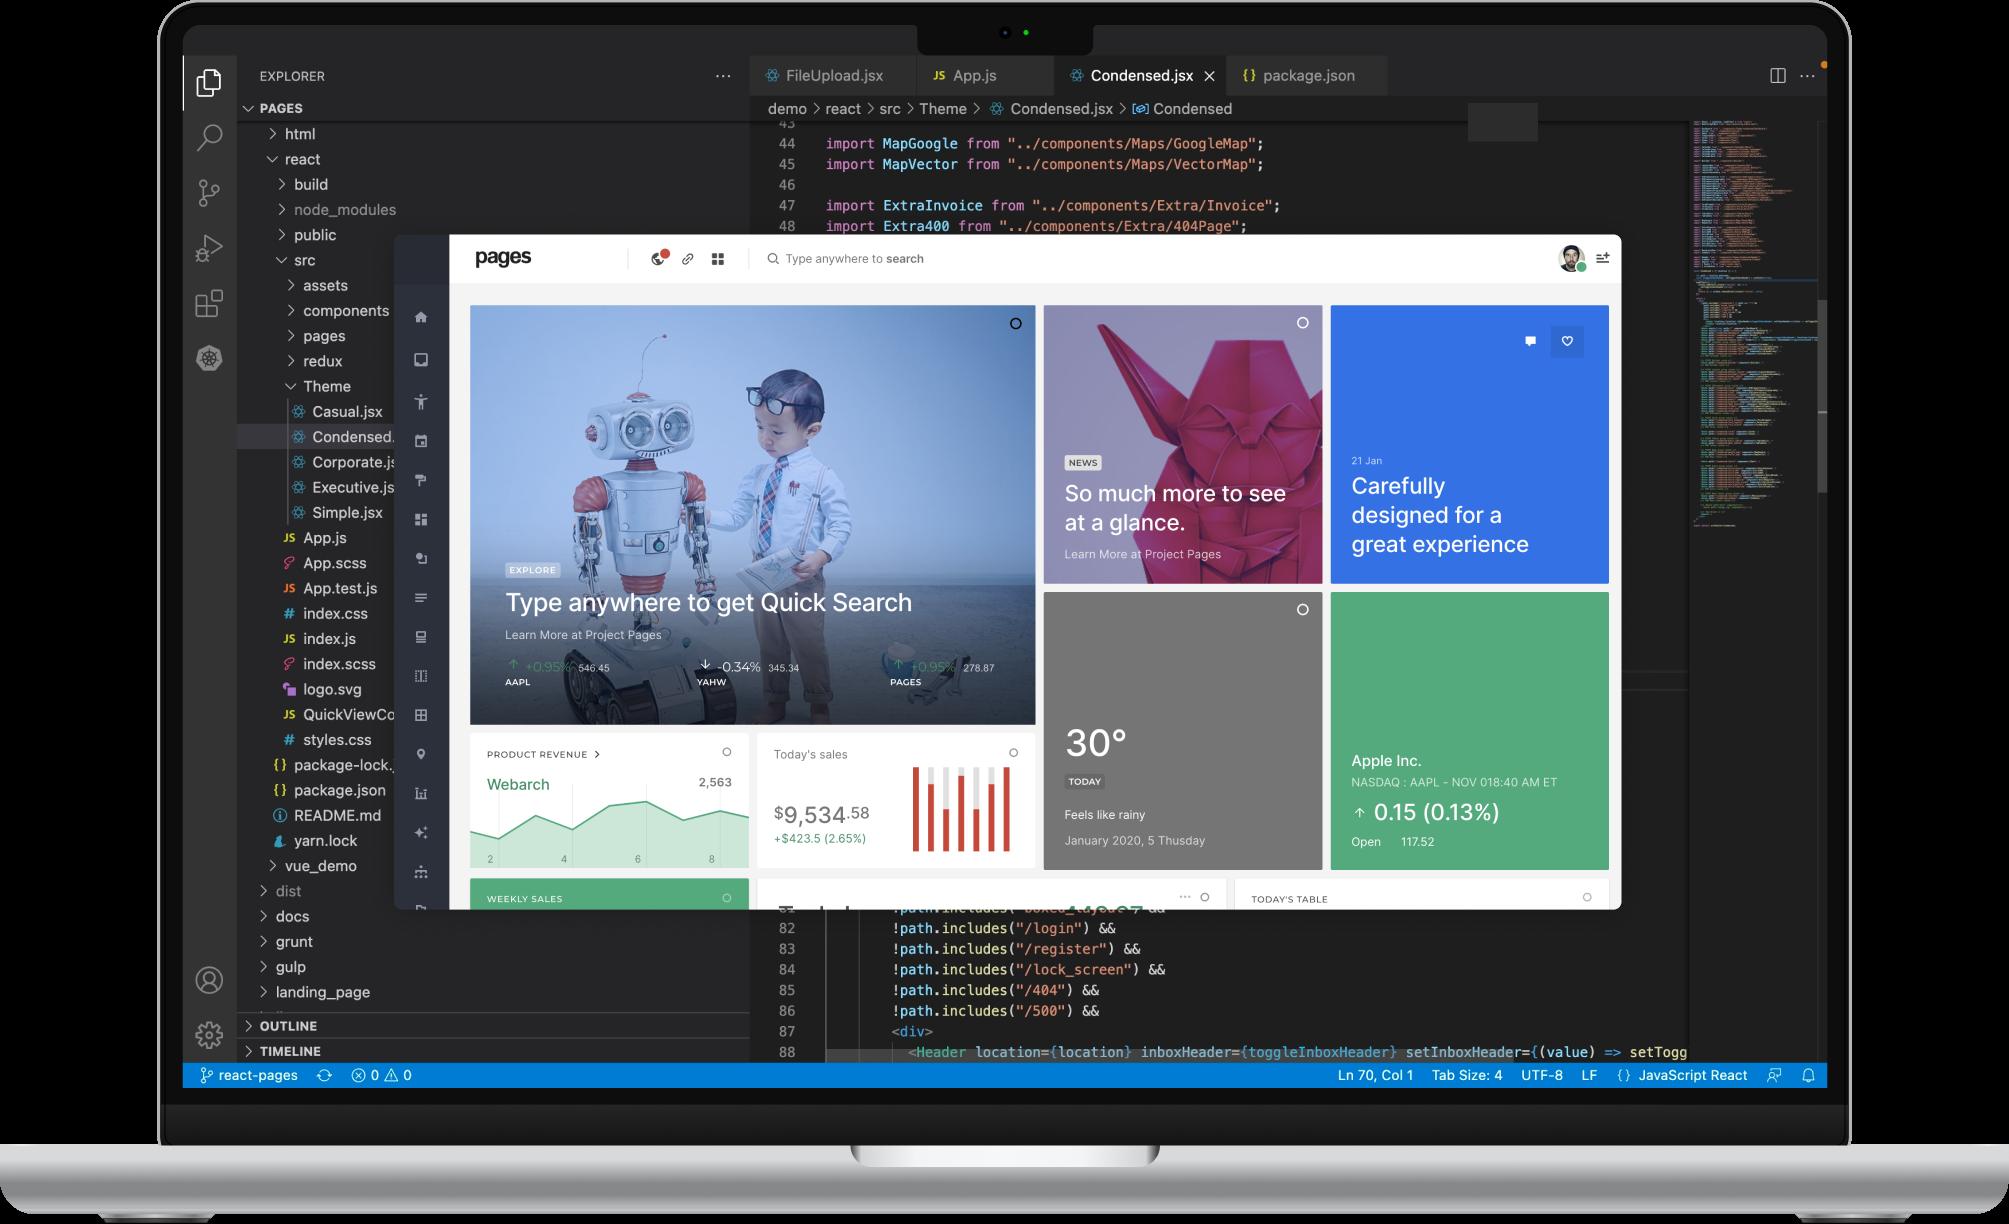 Pages - Dashboard UI Framework